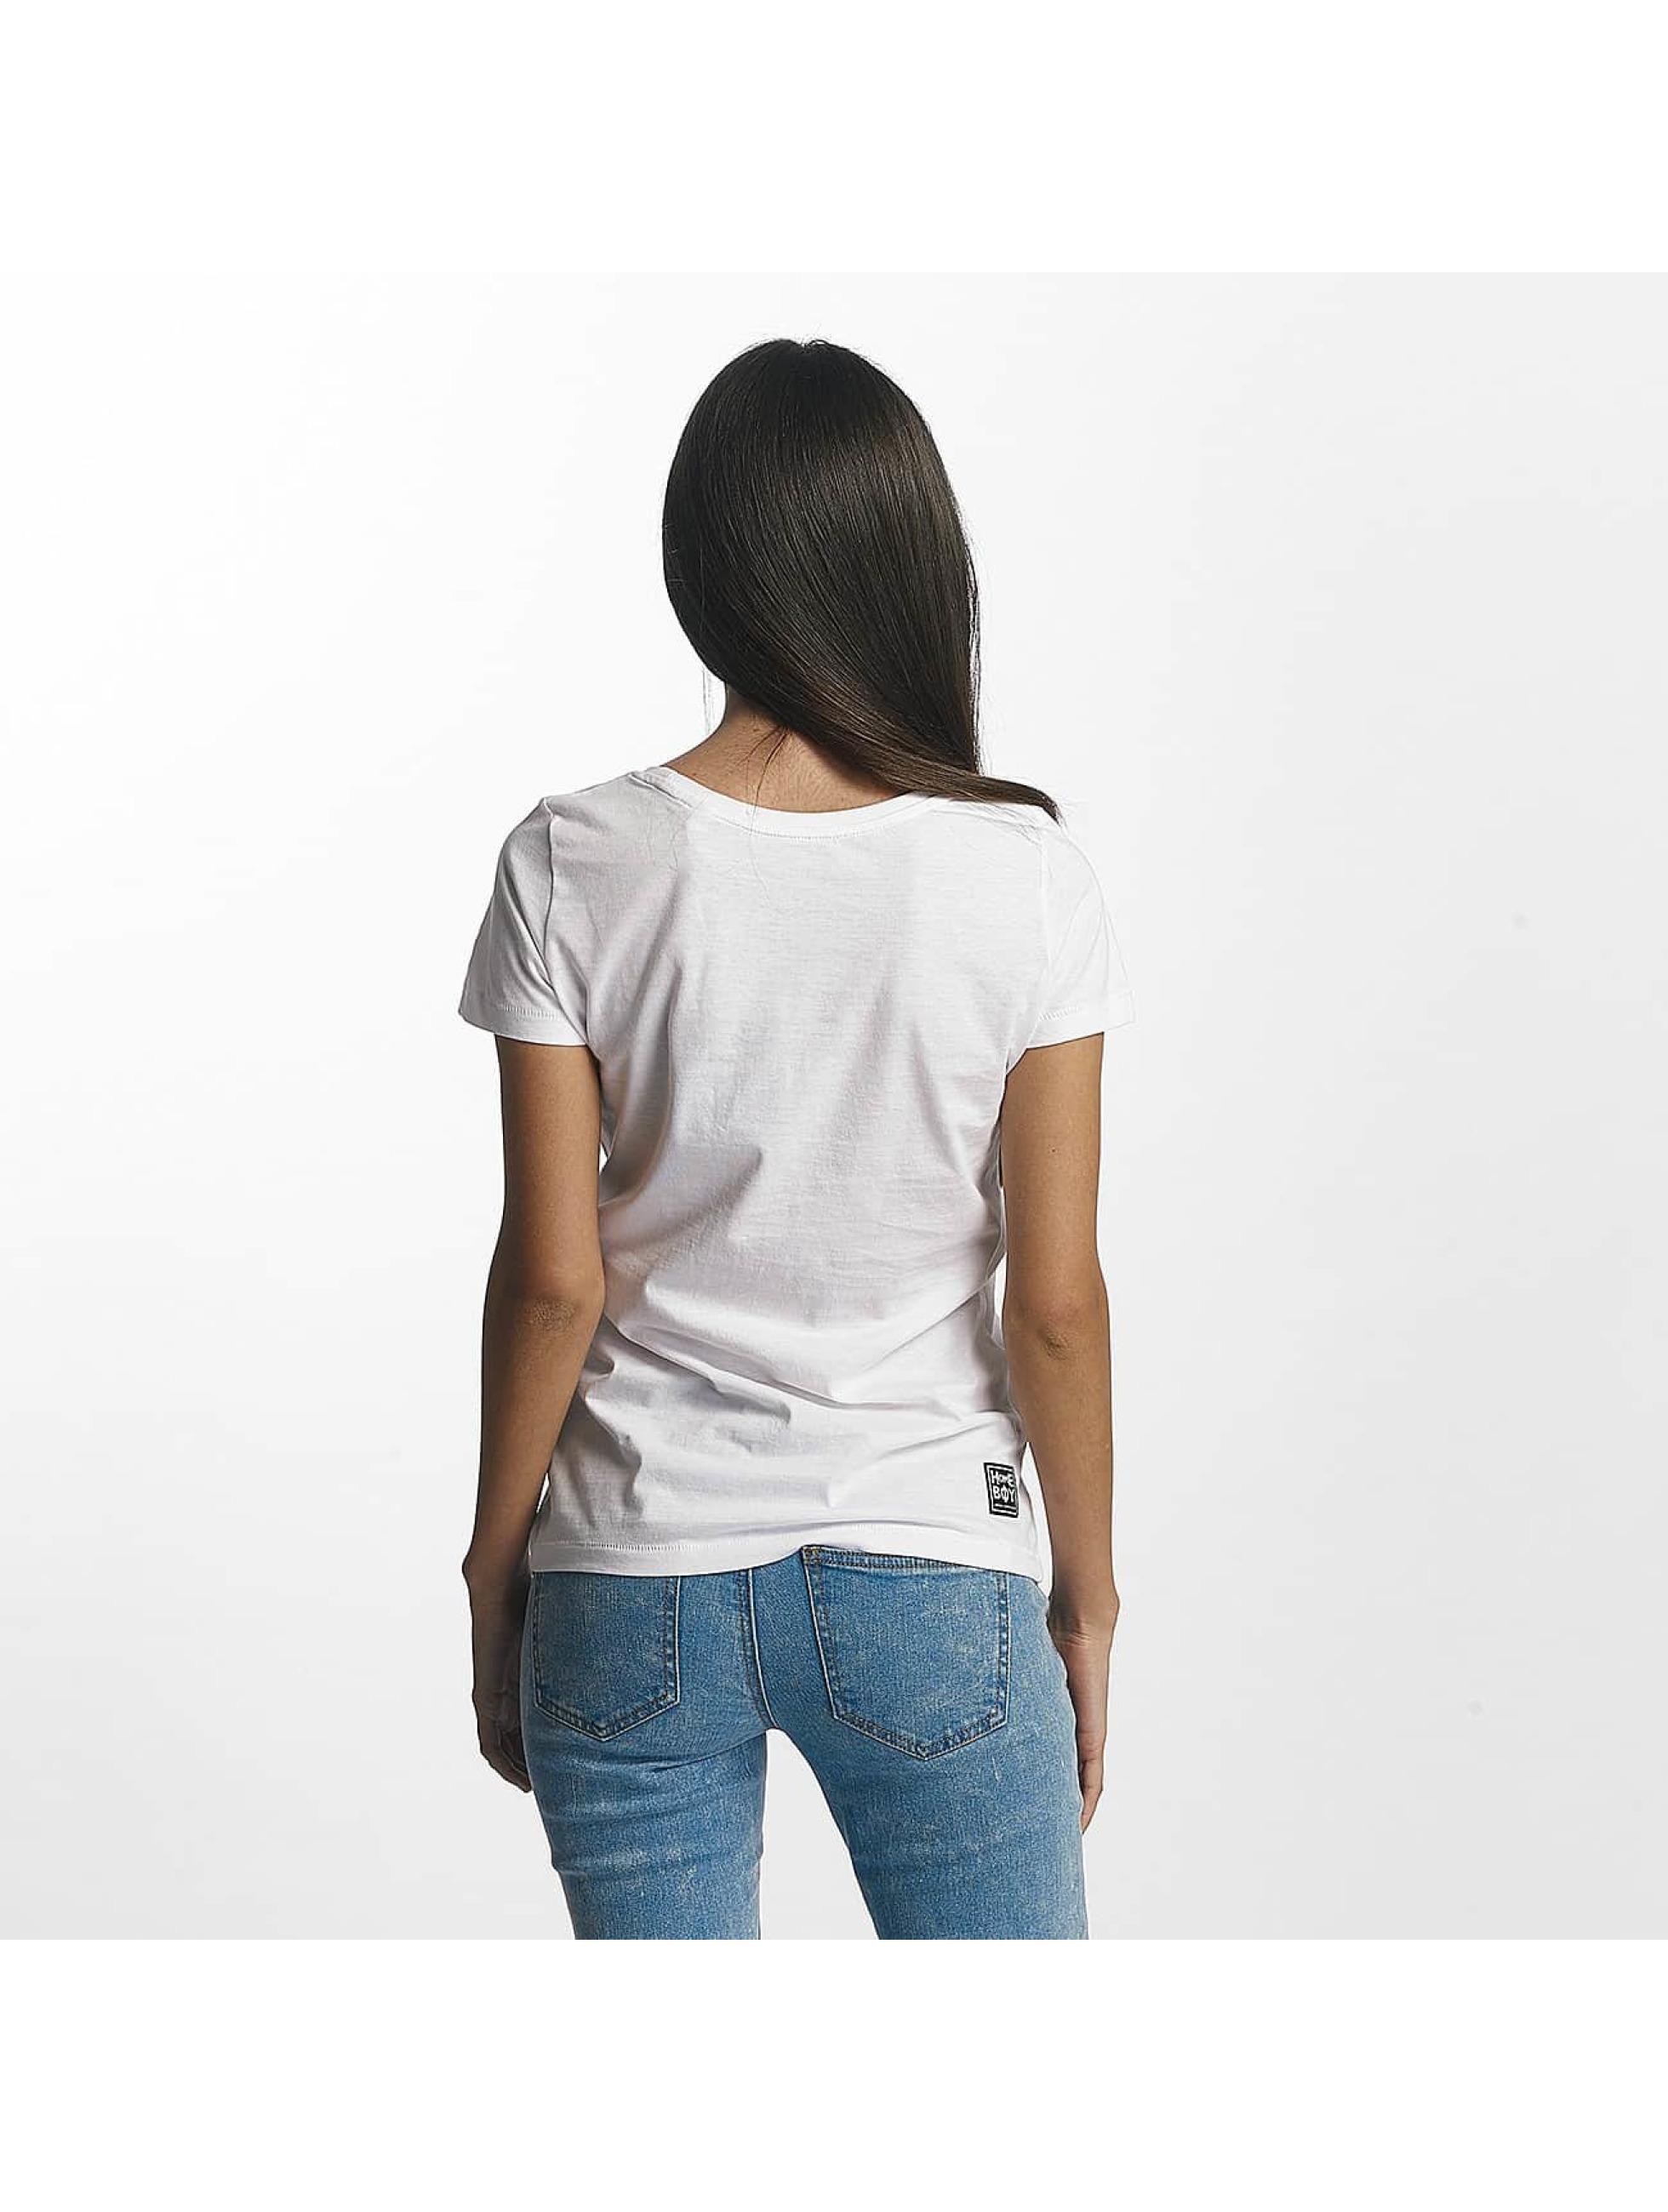 Homeboy T-Shirt Paris blanc